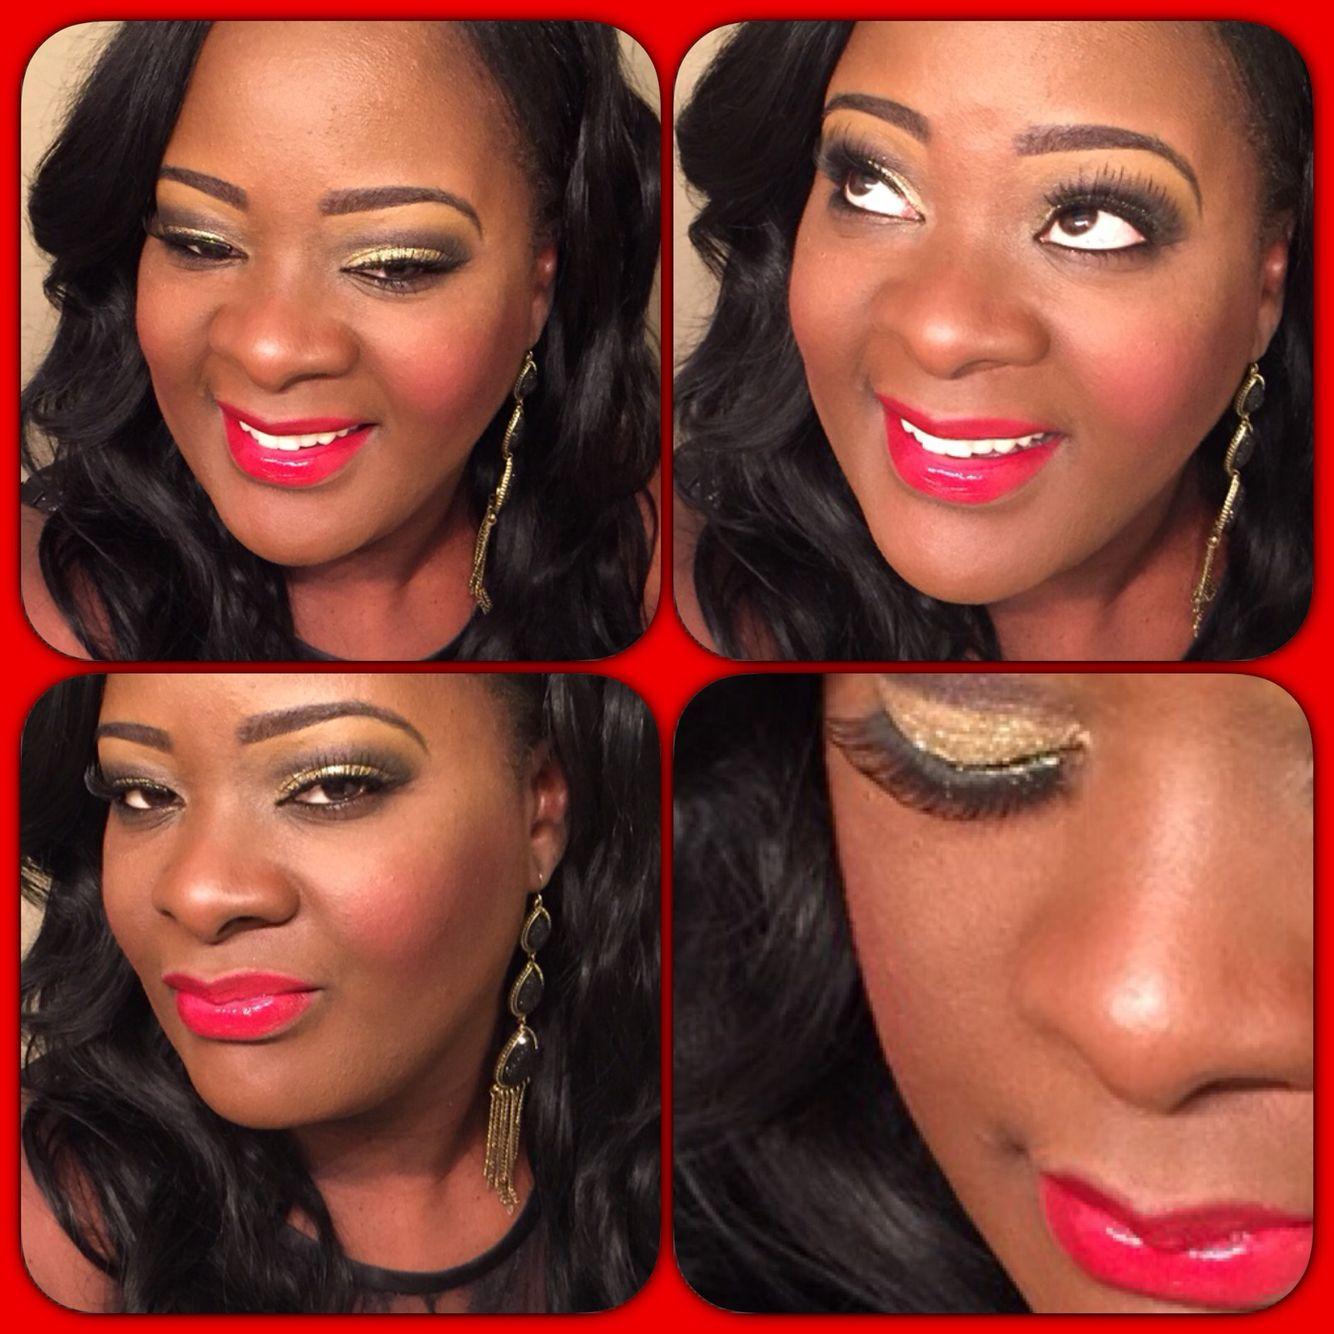 Evening Makeup Gold Glitter Eyeshadow And Red Lipstick Makeup